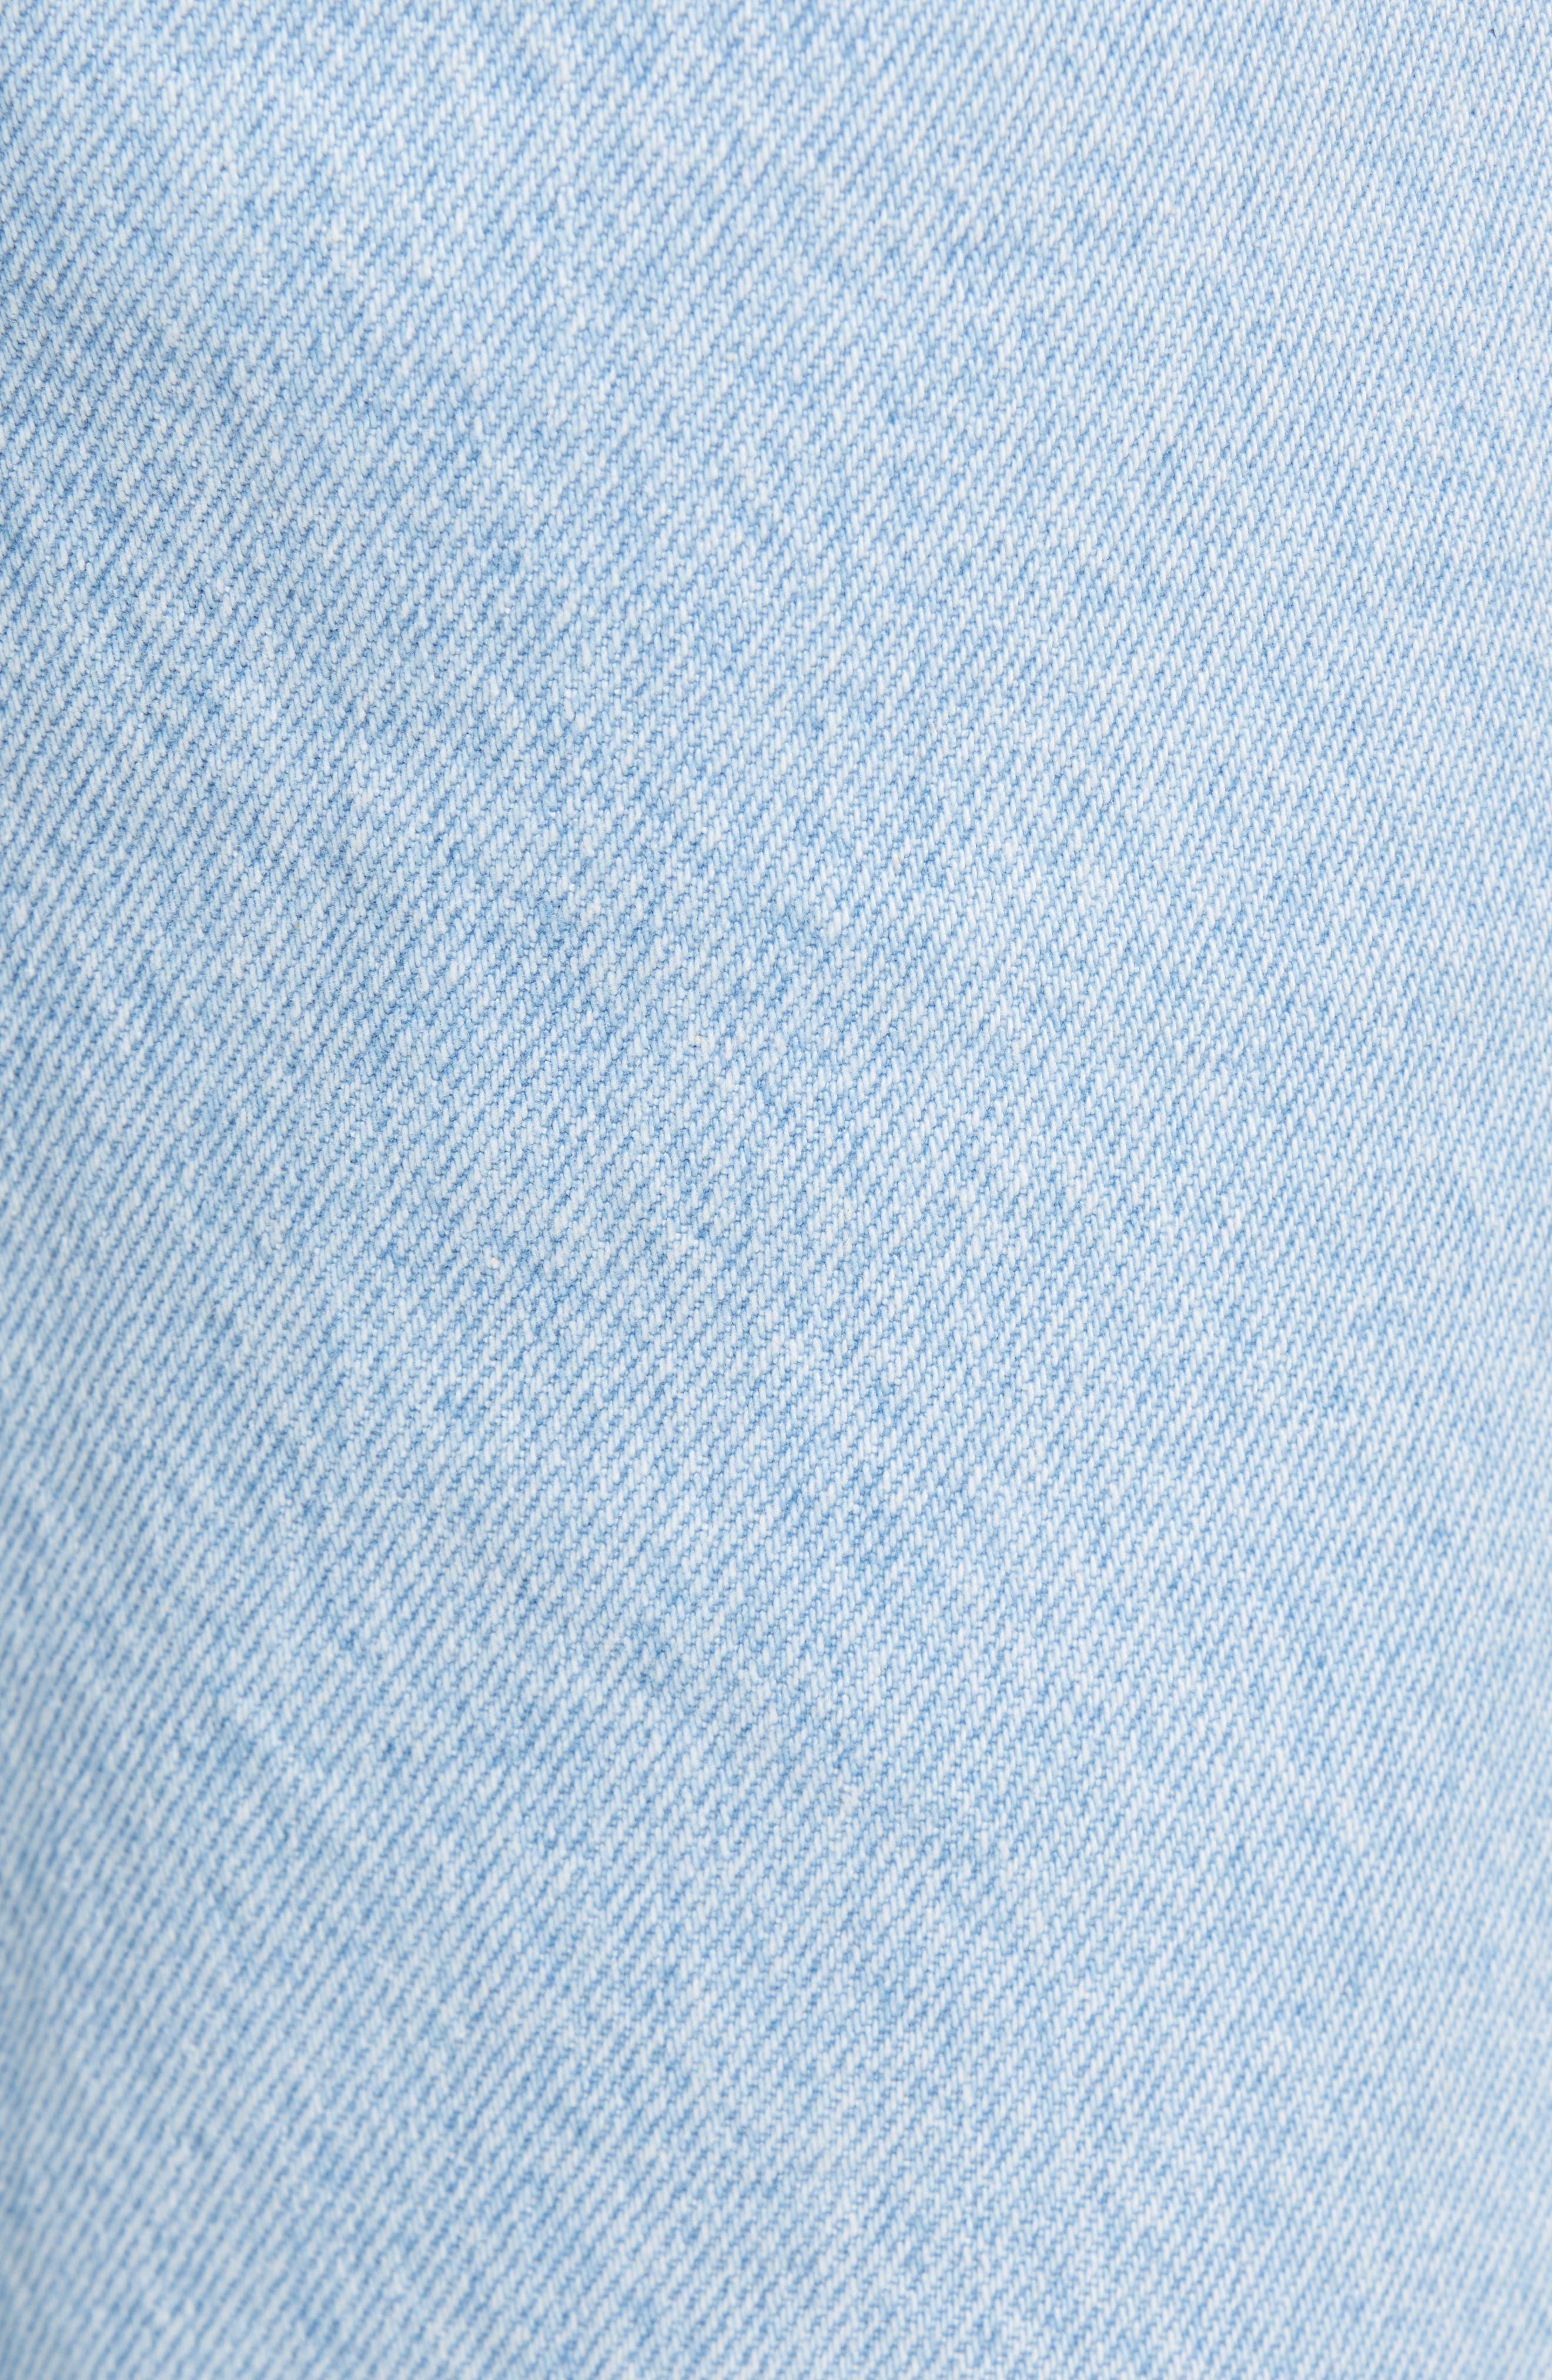 Crest Straight Leg Dad Jeans,                             Alternate thumbnail 5, color,                             LIGHT BLUE DENIM